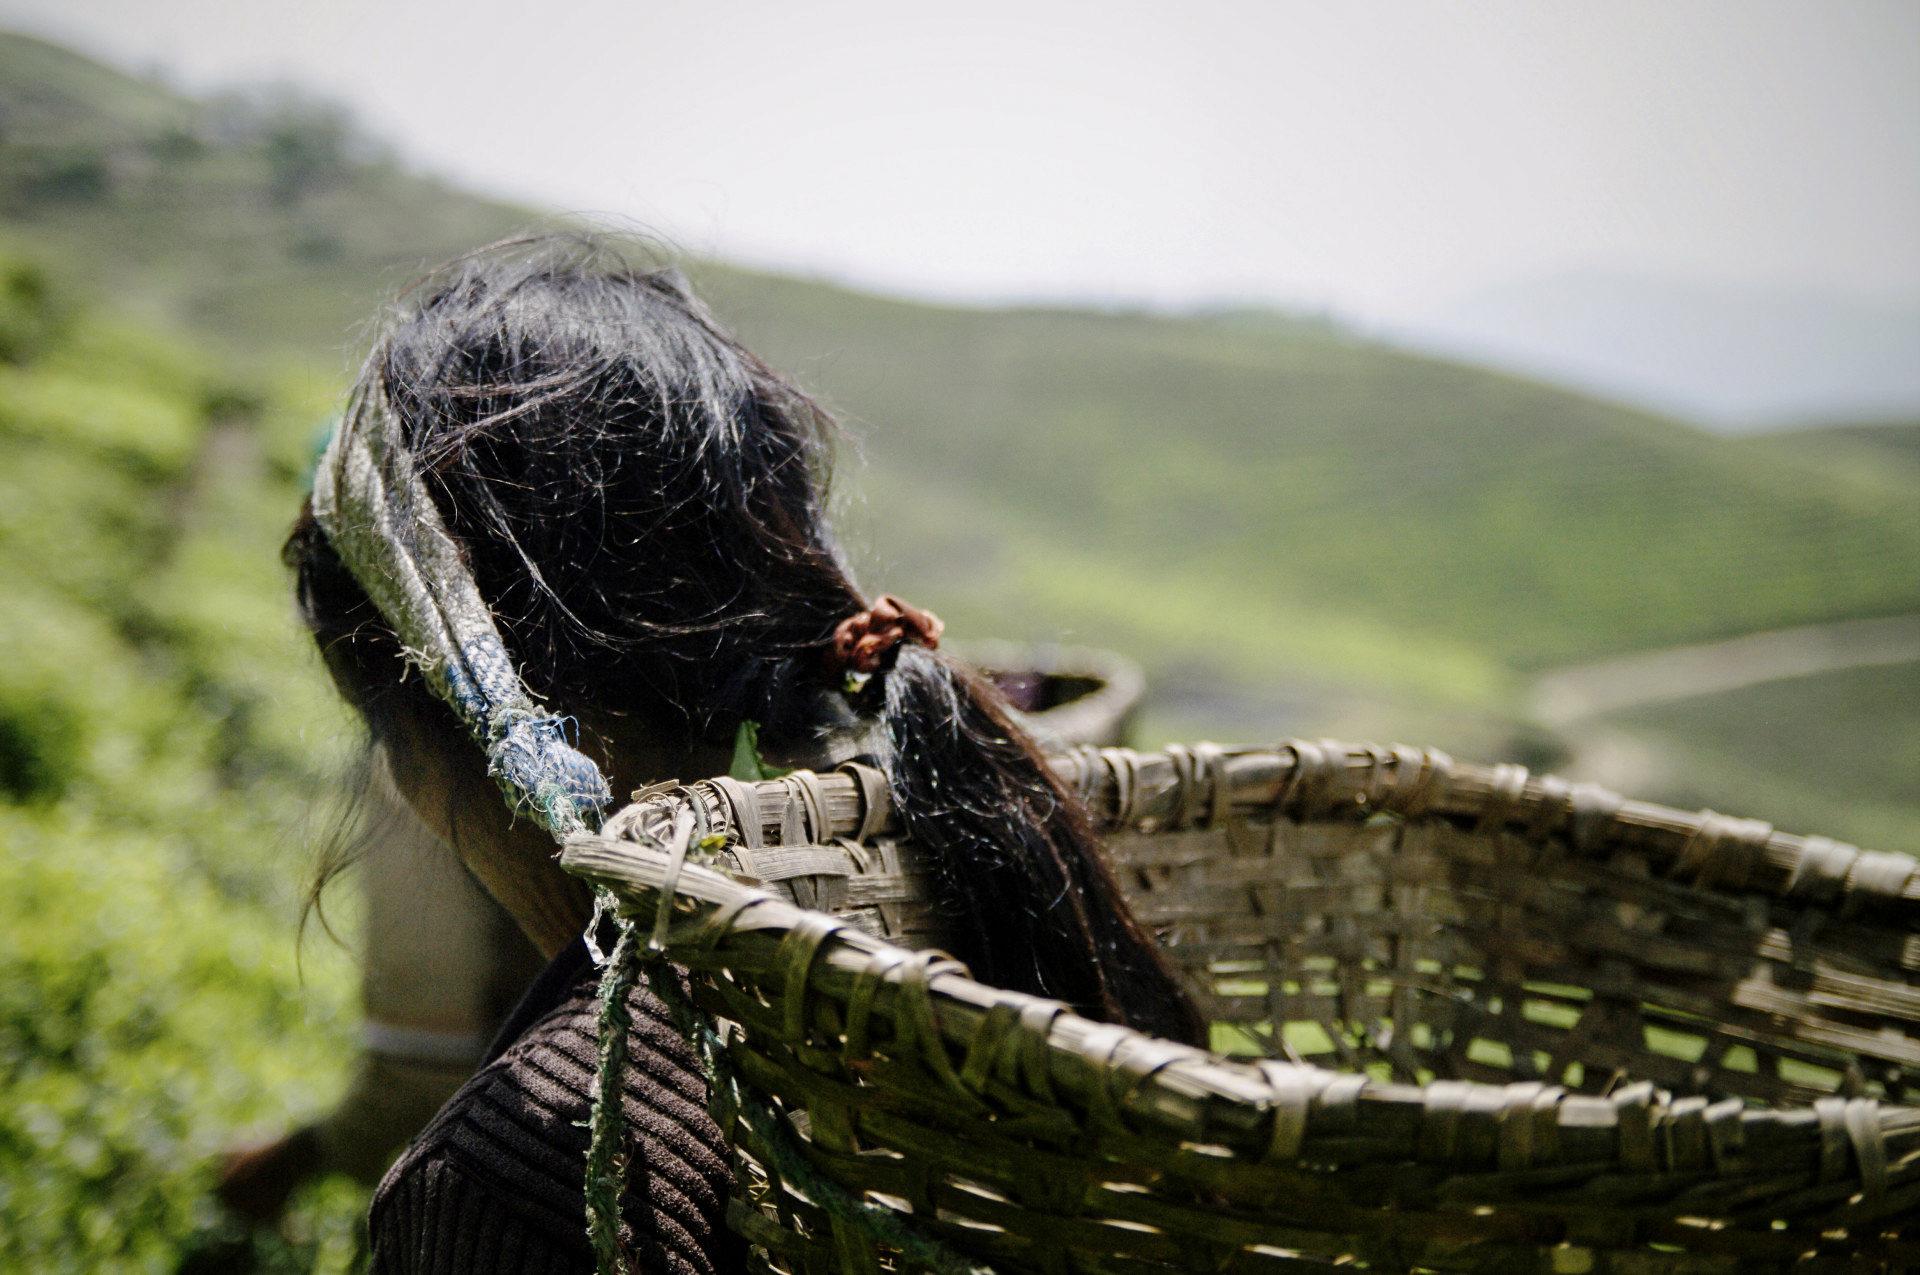 GIZ_Nepal_Organic-Tea_IGP6597b_Carolin-Weinkopf